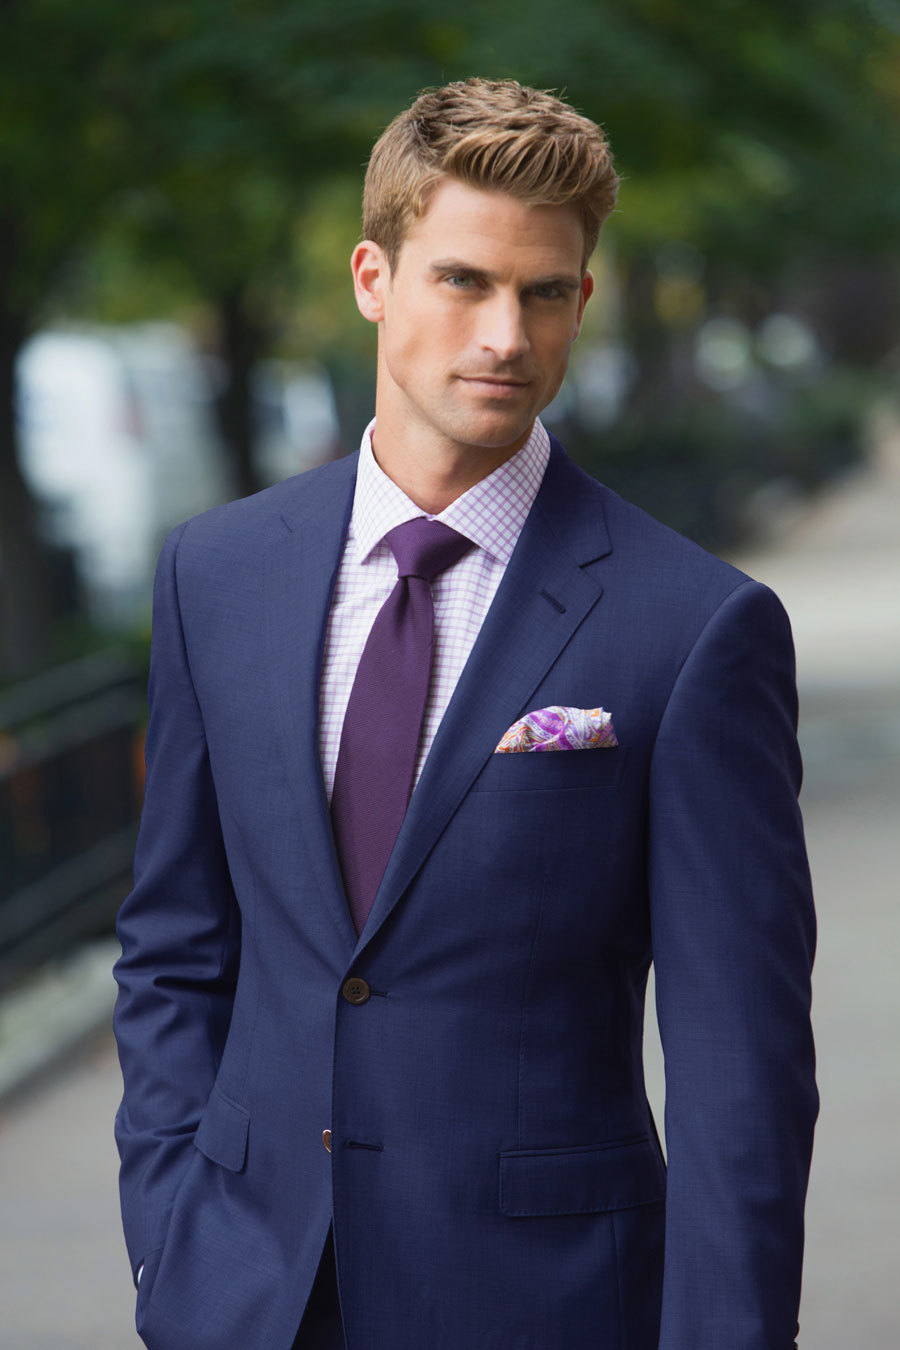 Mens Navy Suit White Check Dress Shirt Dark Purple Tie Purple